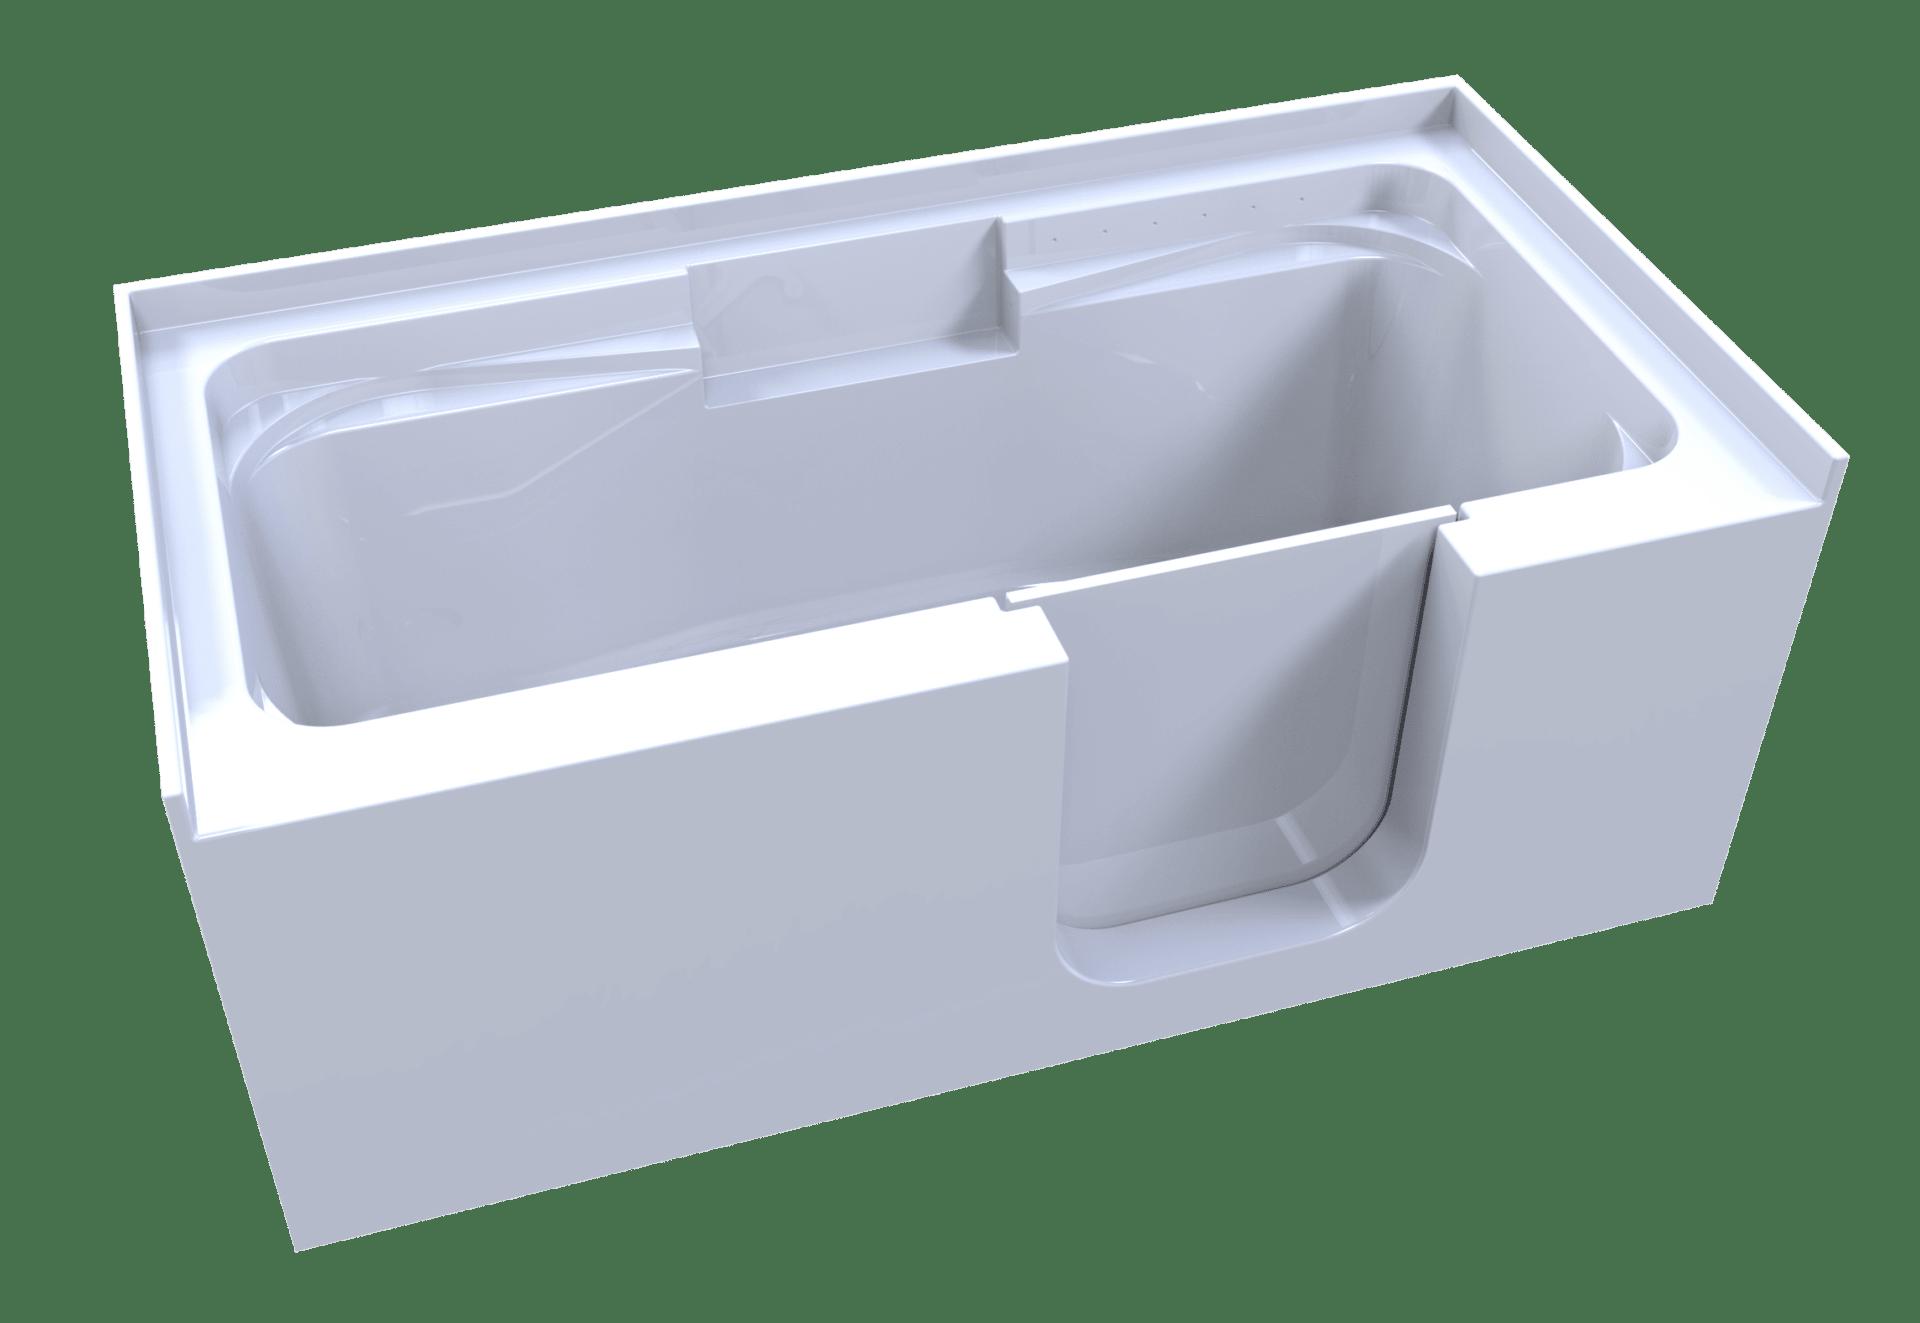 3d model of so-lo style walk-in bathtub, no water